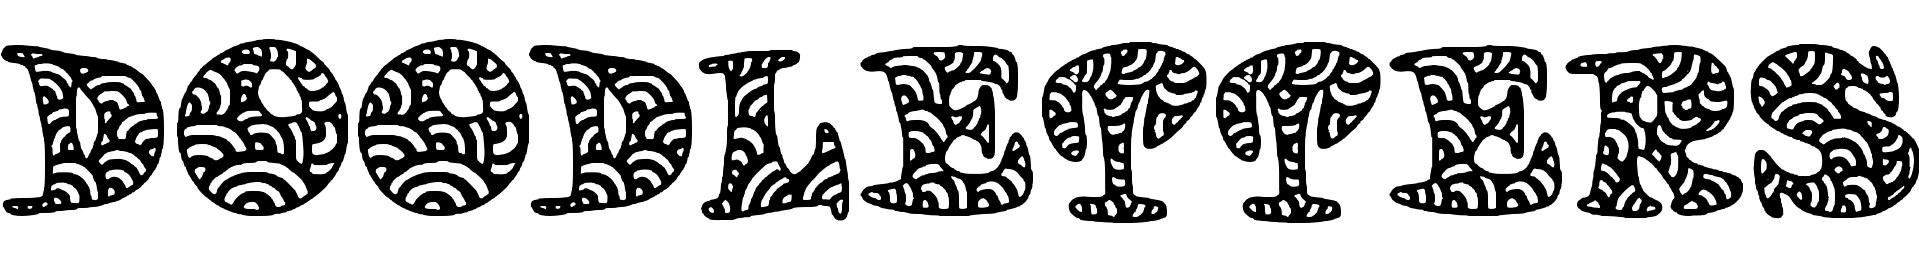 Doodletters